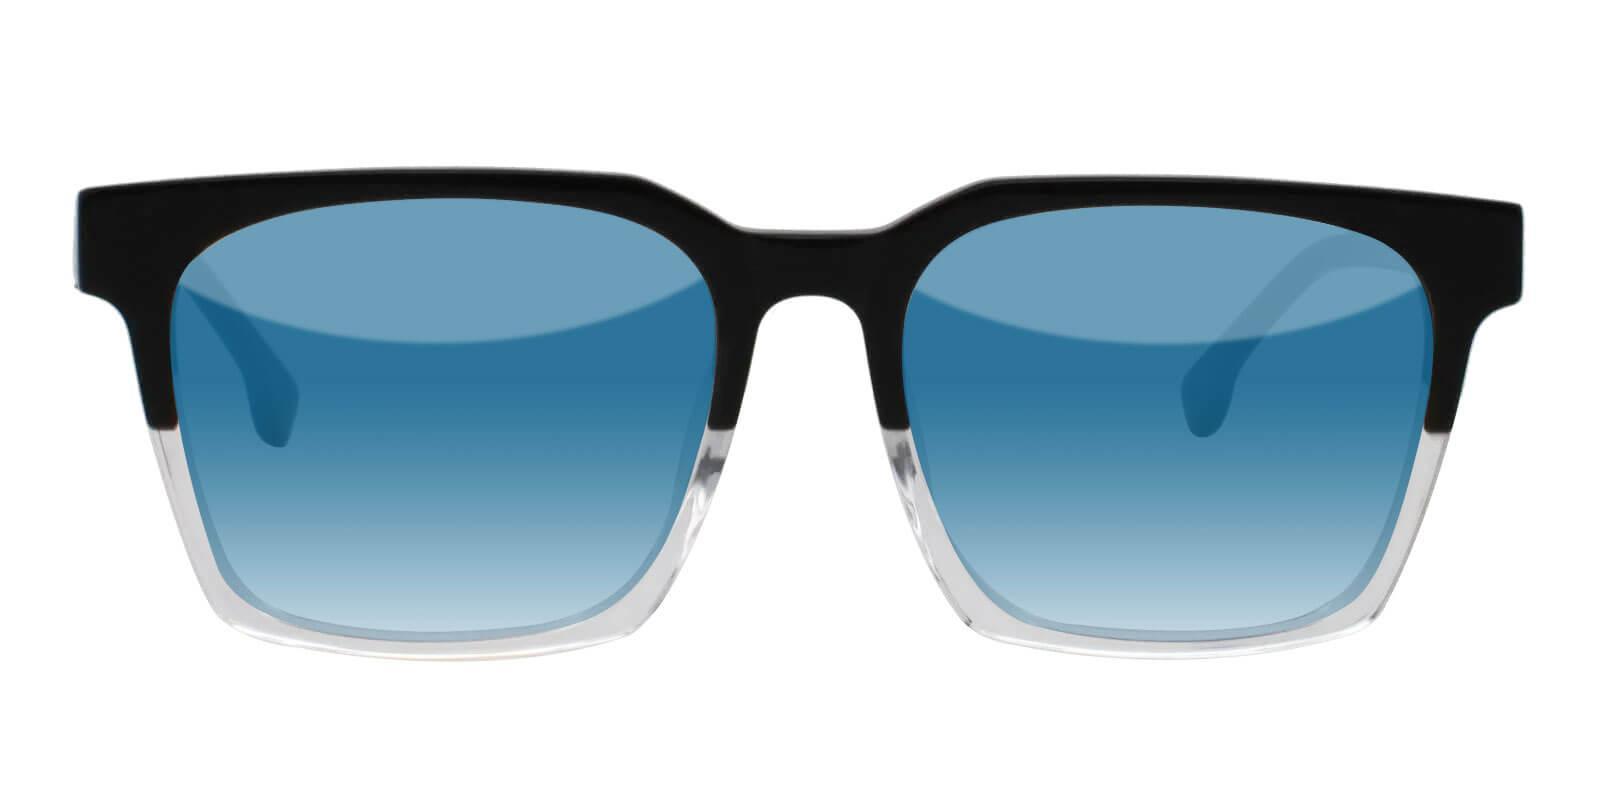 Nala Translucent Acetate SpringHinges , Sunglasses , UniversalBridgeFit Frames from ABBE Glasses